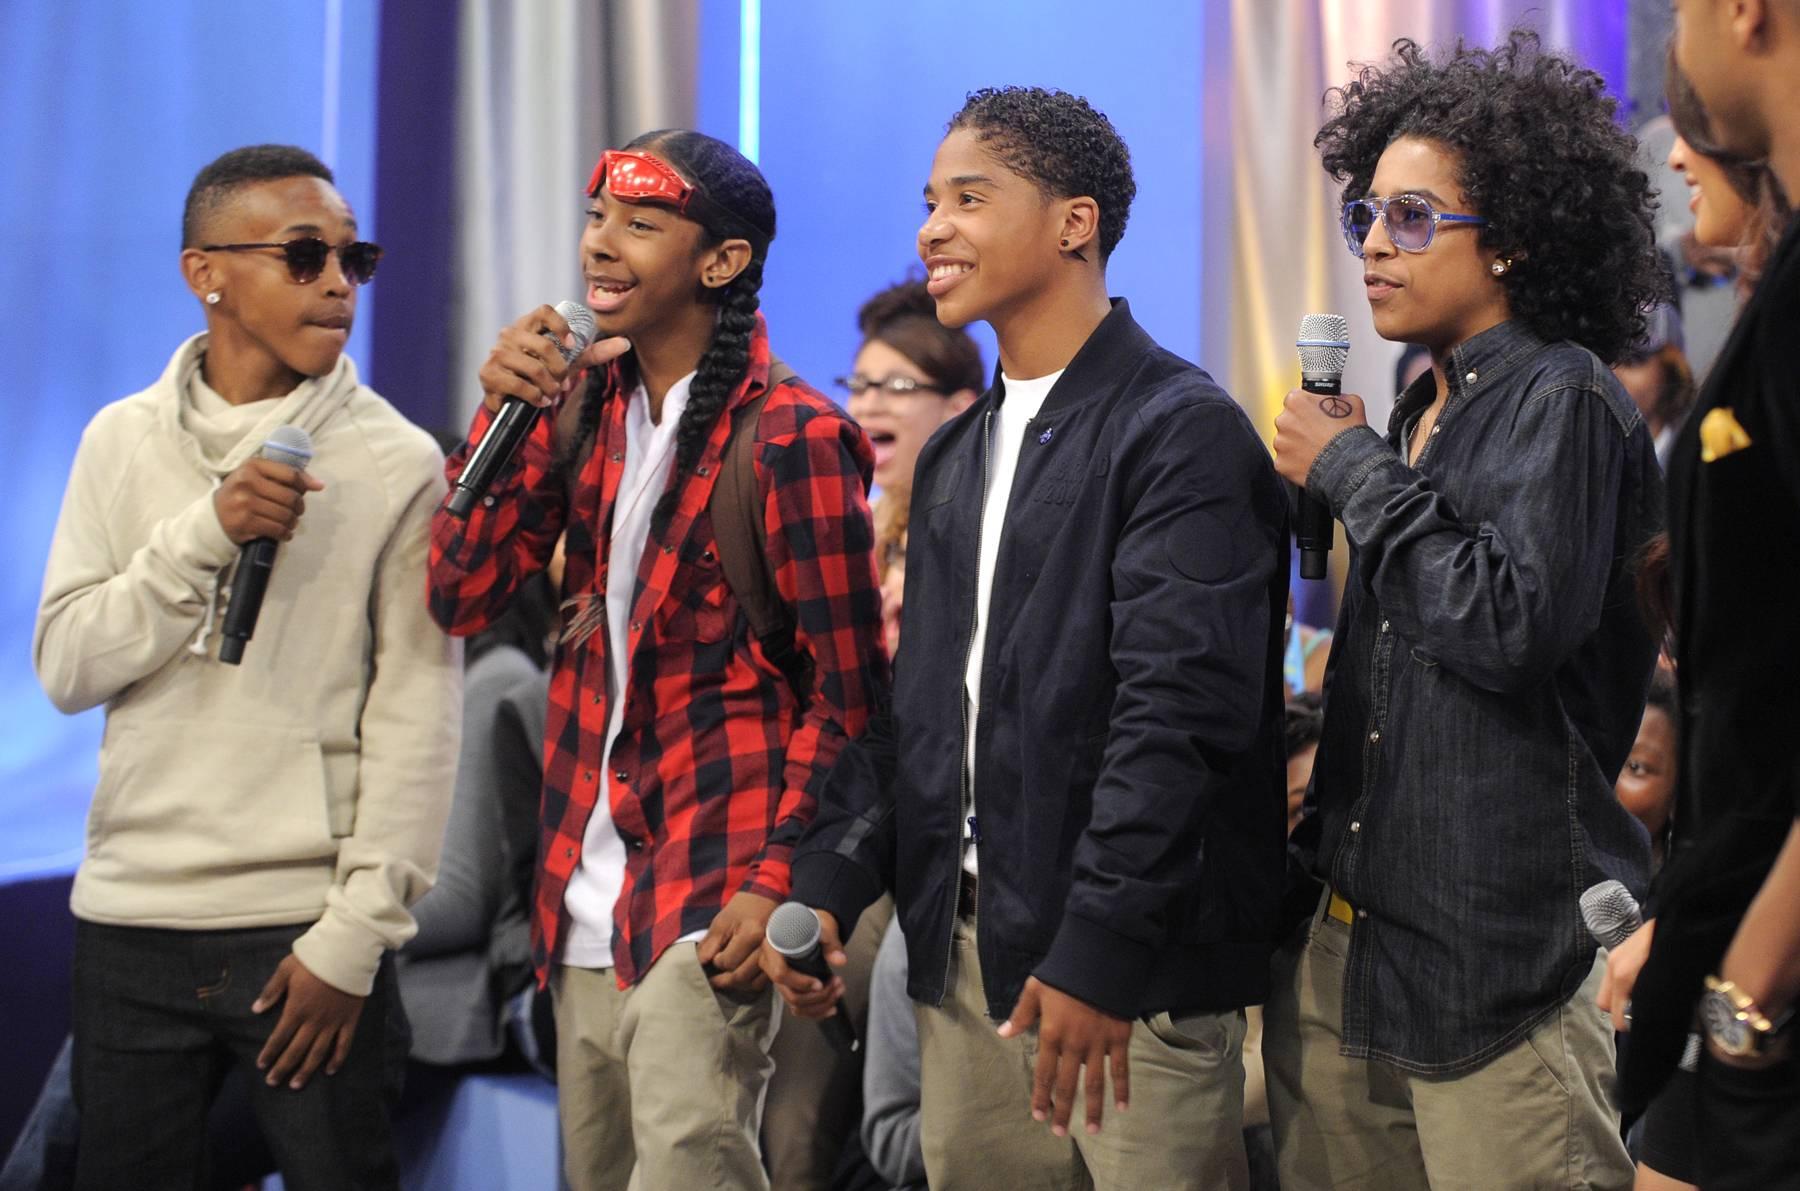 The Only Boy Band That Matters - Mindless Behavior at 106 & Park, May 22, 2012. (Photo: John Ricard / BET)